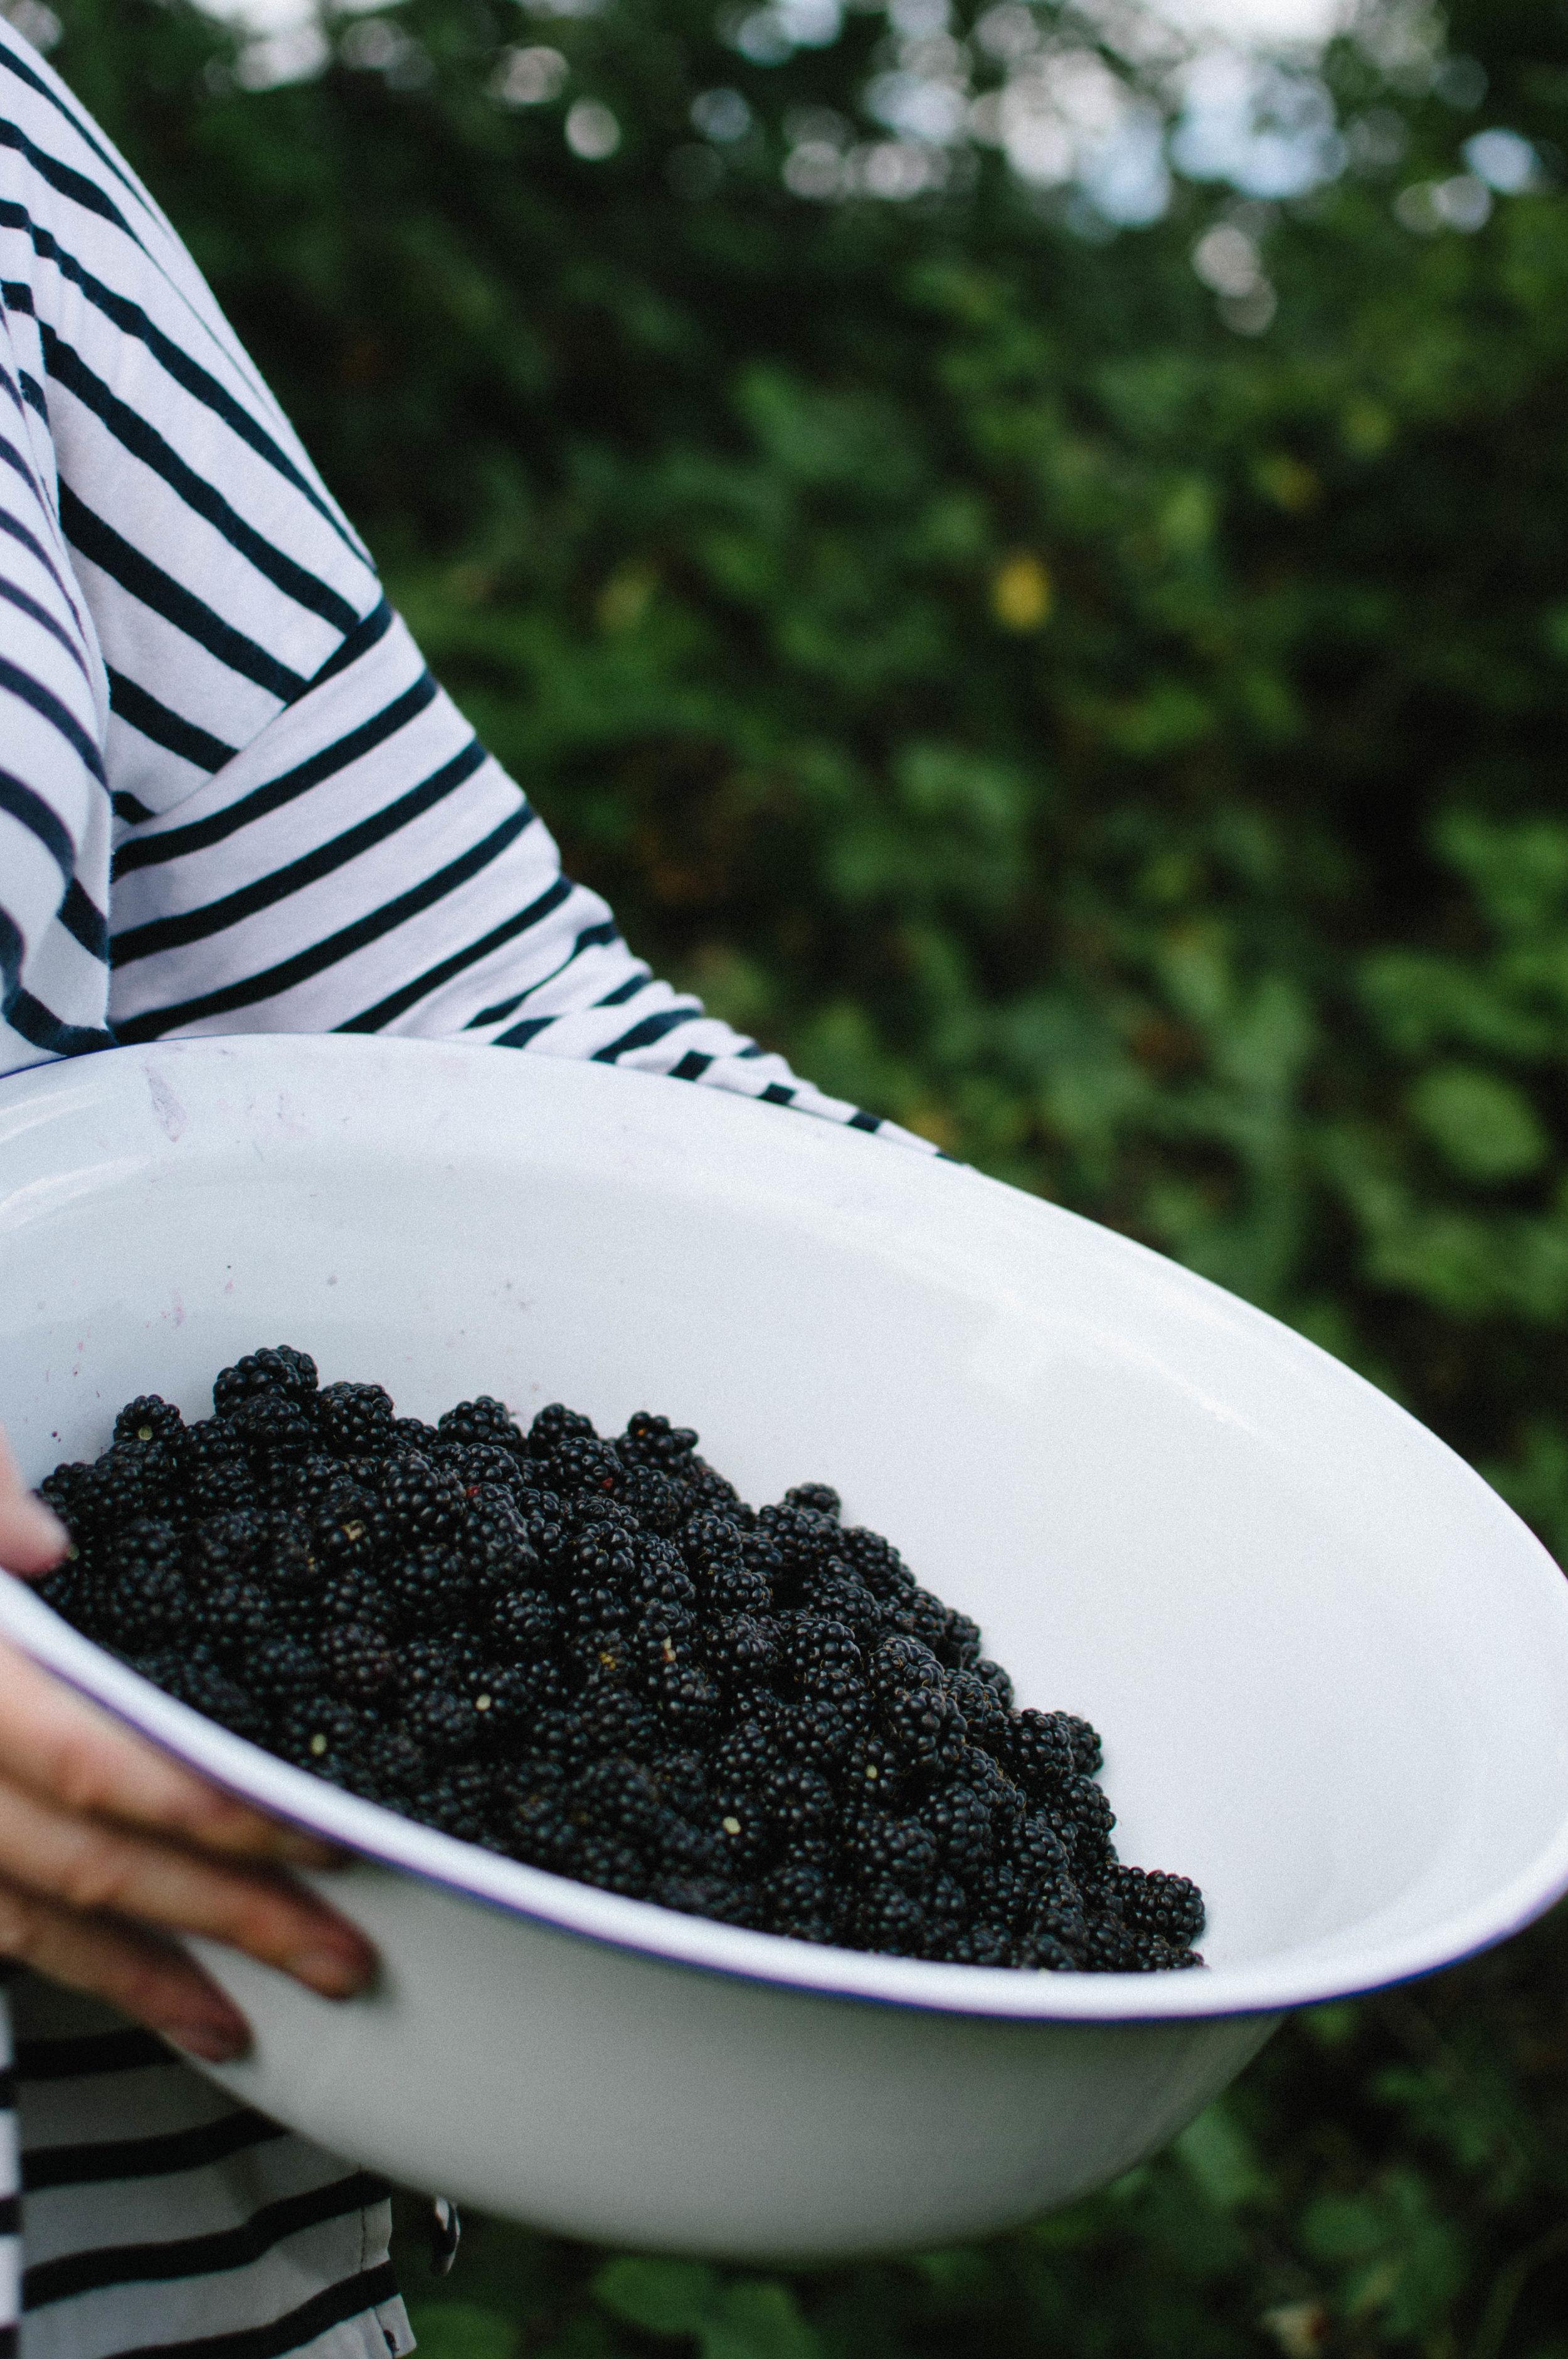 Blackberry & Bay Leaf Jam - 1.5kg blackberries, fresh or frozen1kg jam sugar1 lemon, zested4 tsp lemon juicePinch of salt2 dried bay leaves